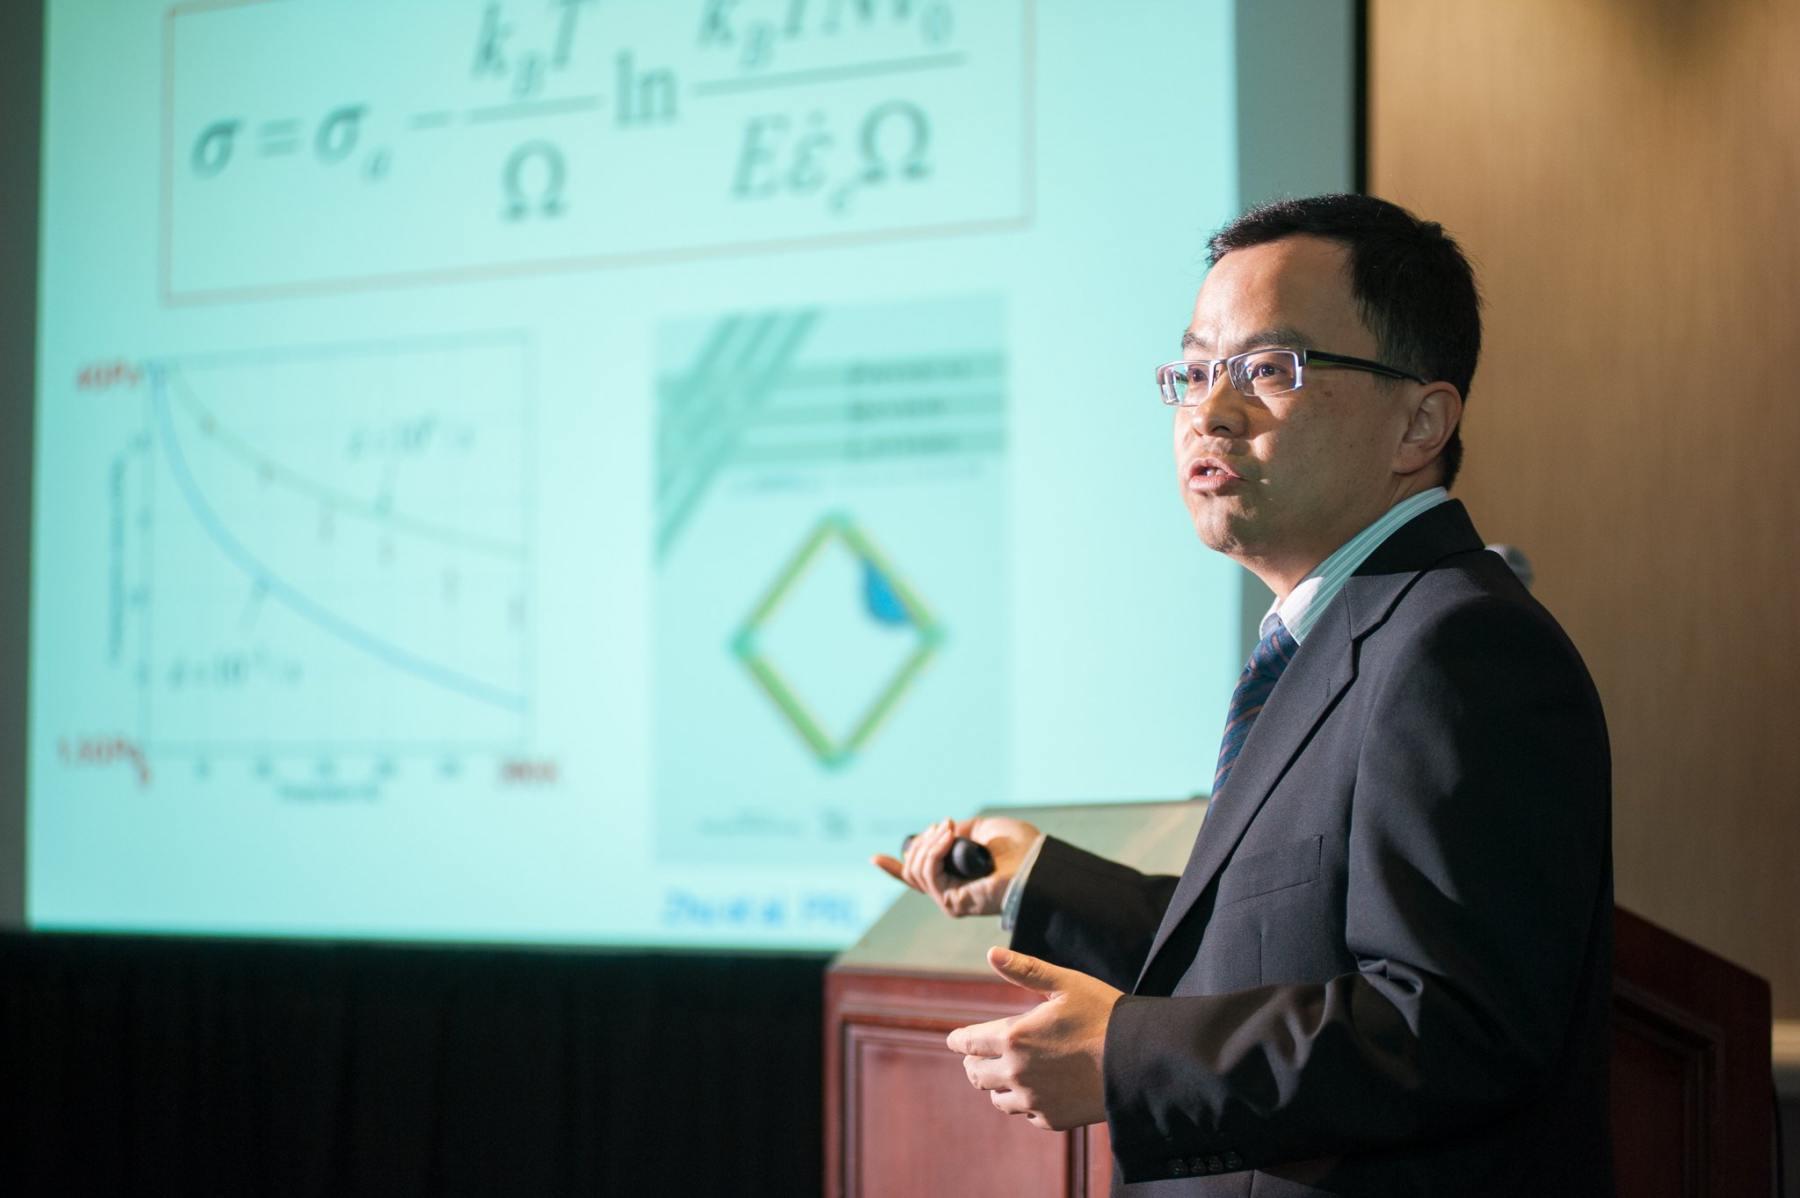 Conference breakout session presentation